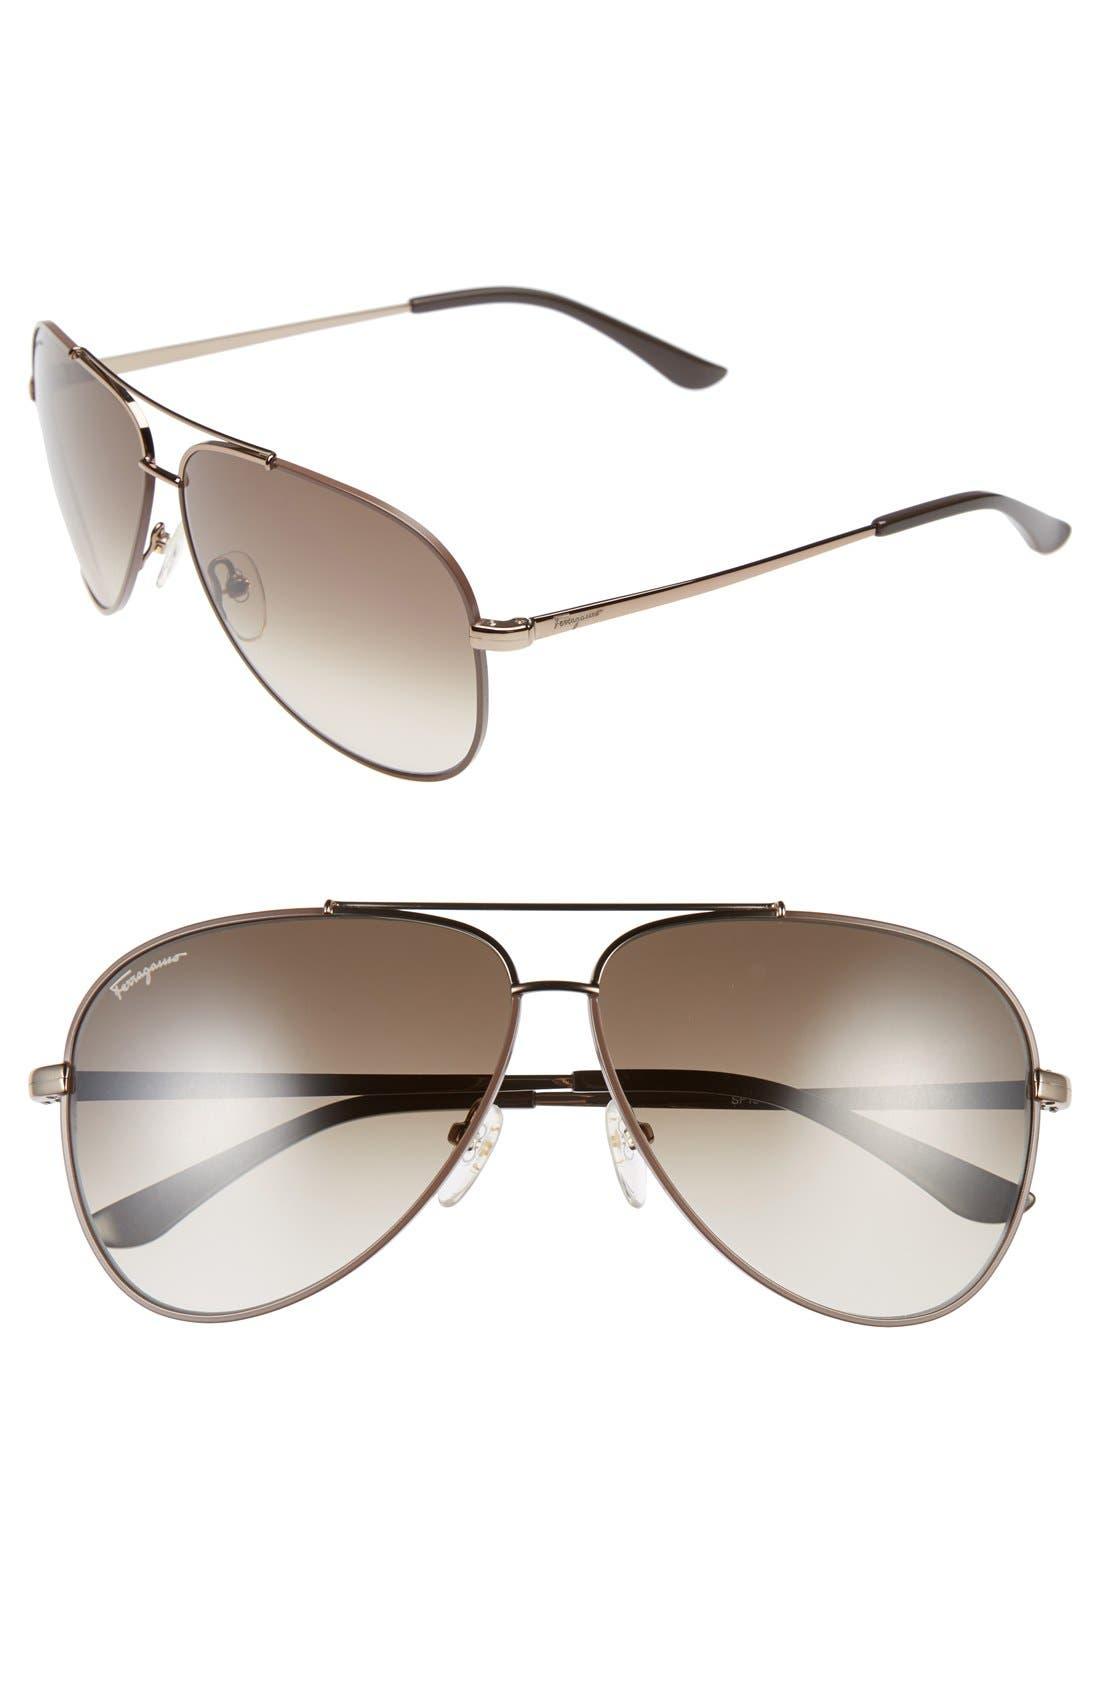 Alternate Image 1 Selected - Salvatore Ferragamo 60mm Aviator Sunglasses